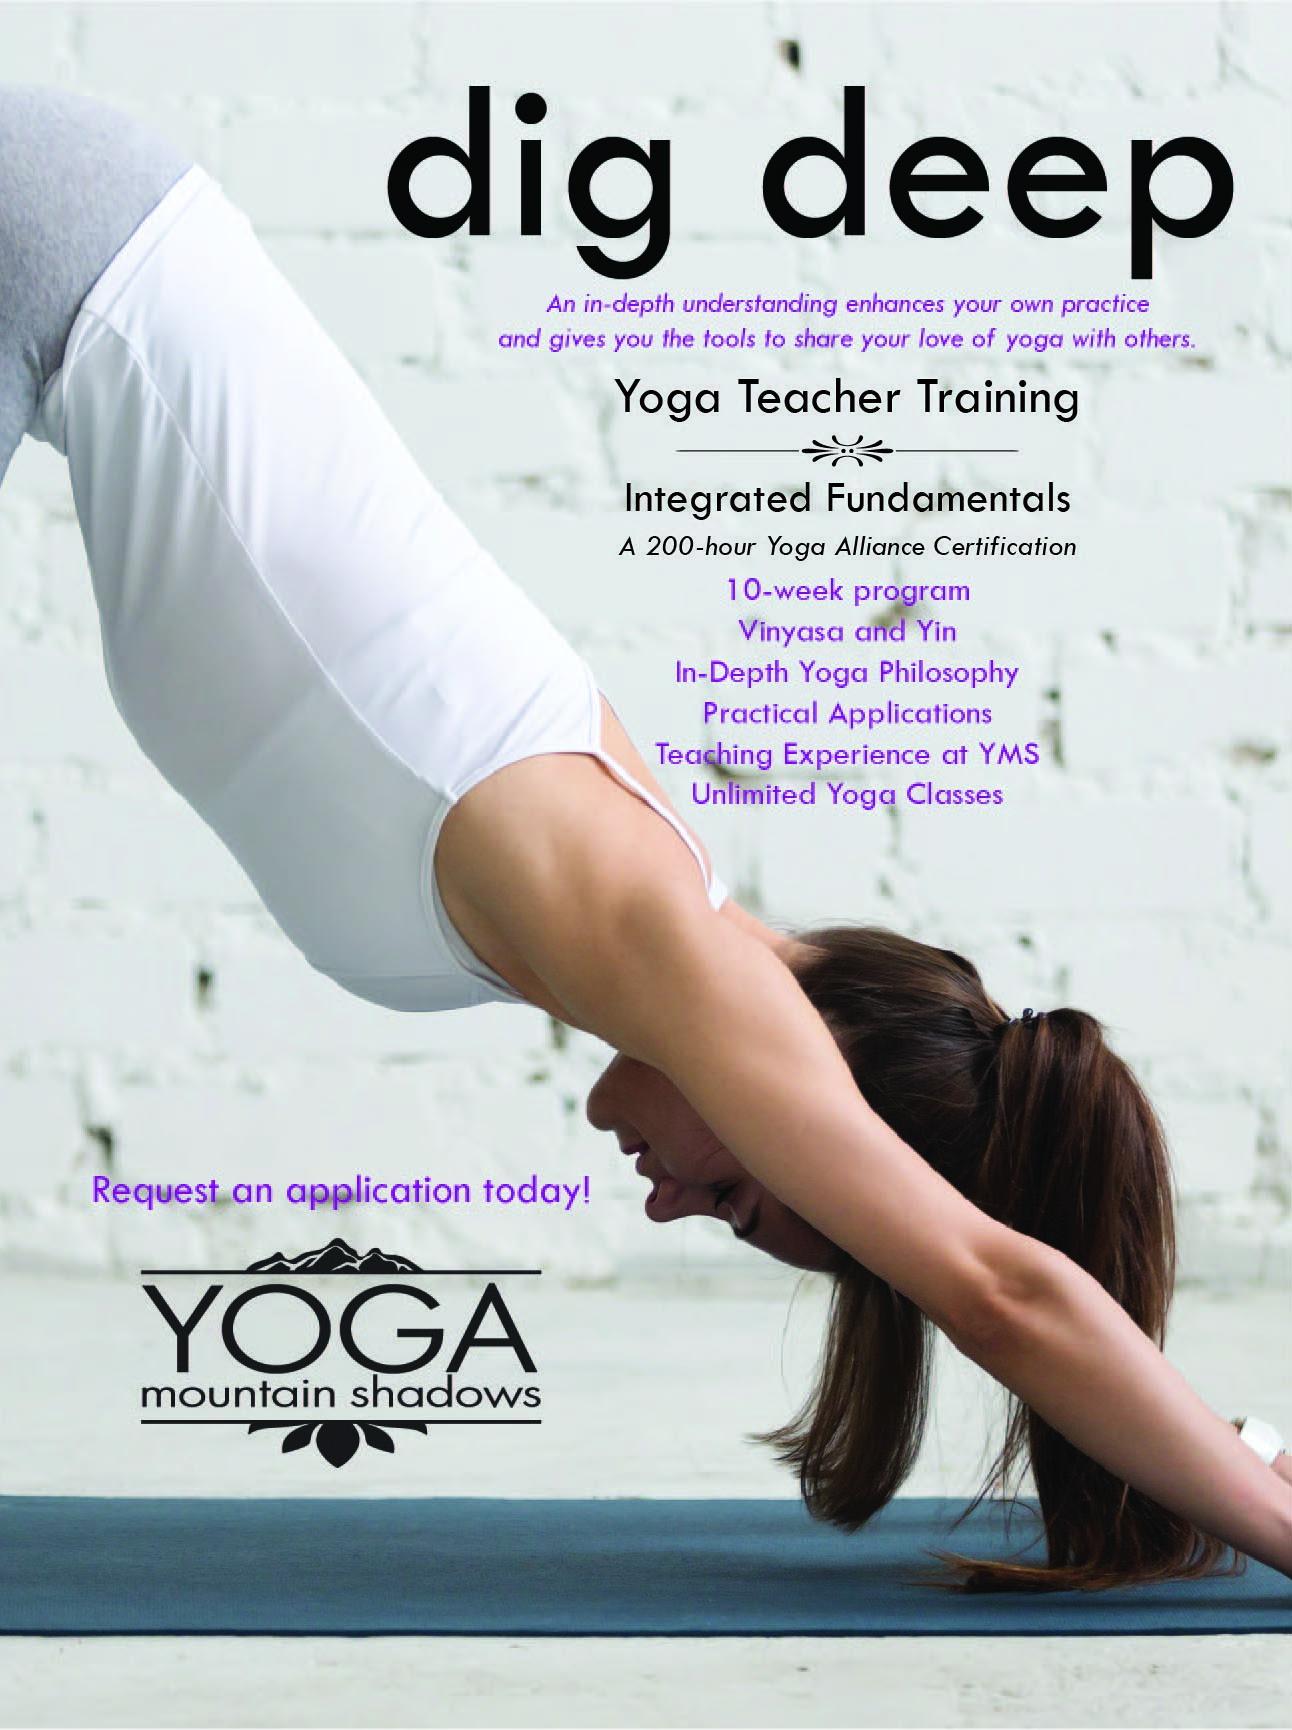 Yoga Teacher Training Presented By Yoga Mountain Shadows Peakradarcom